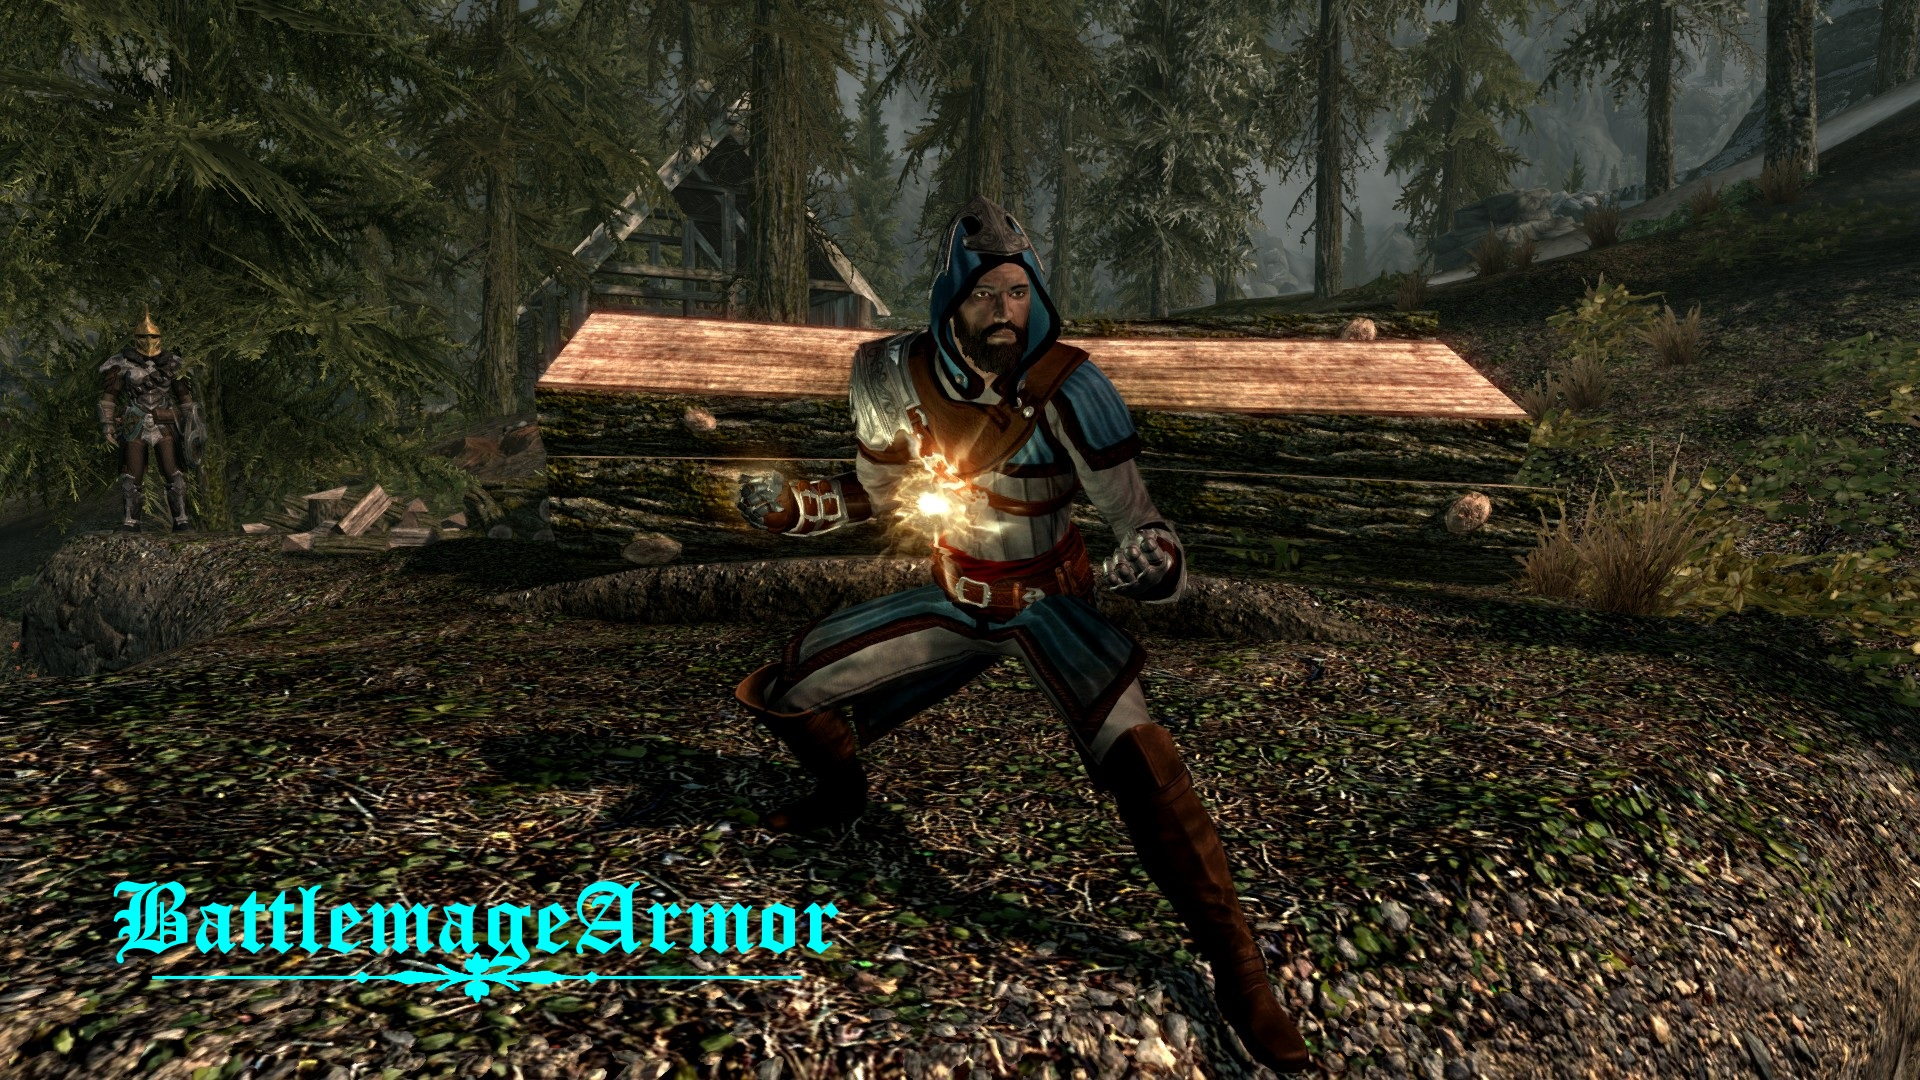 BattlemageArmor_L.jpg